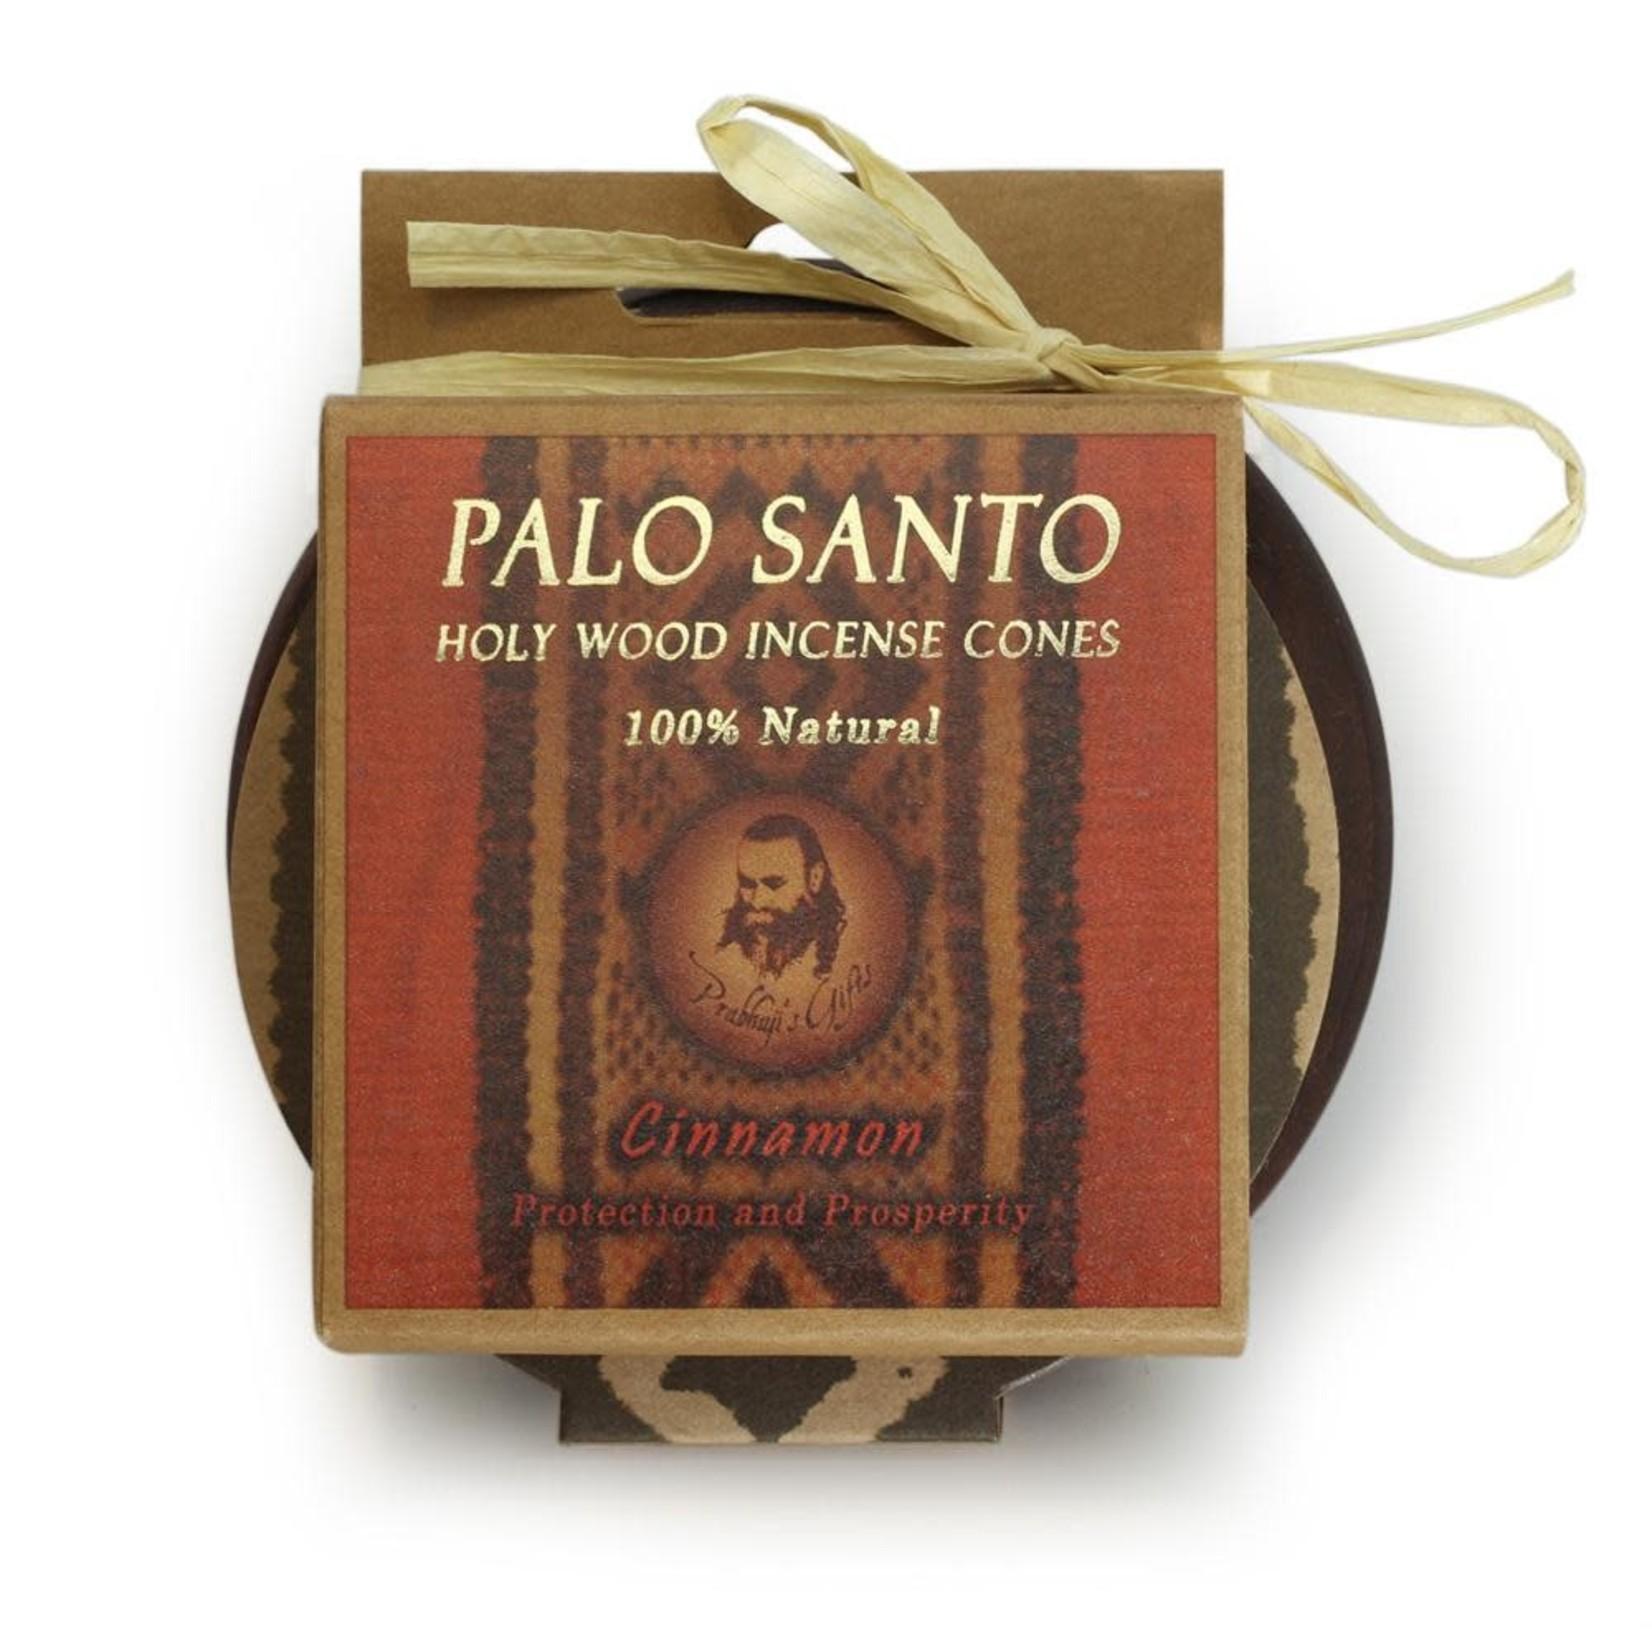 Prabhujis Gifts Palo Santo Cinnamon Cones with Burner